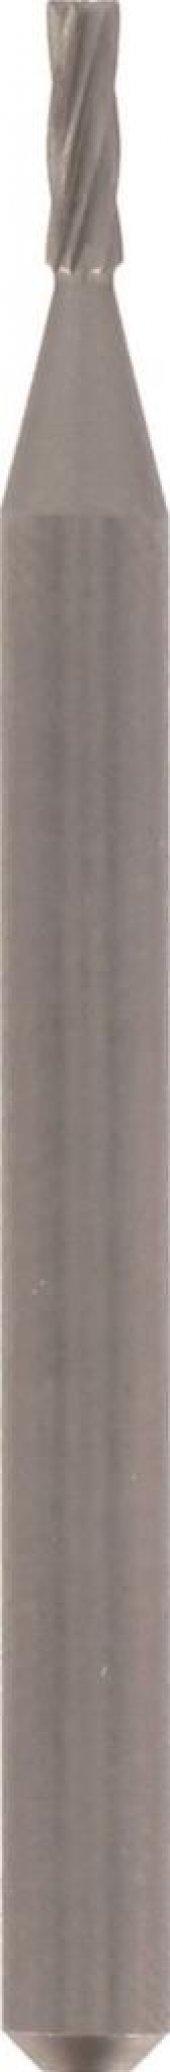 Dremel Yüksek Devirli Kesici 2,0 Mm (193) (2...